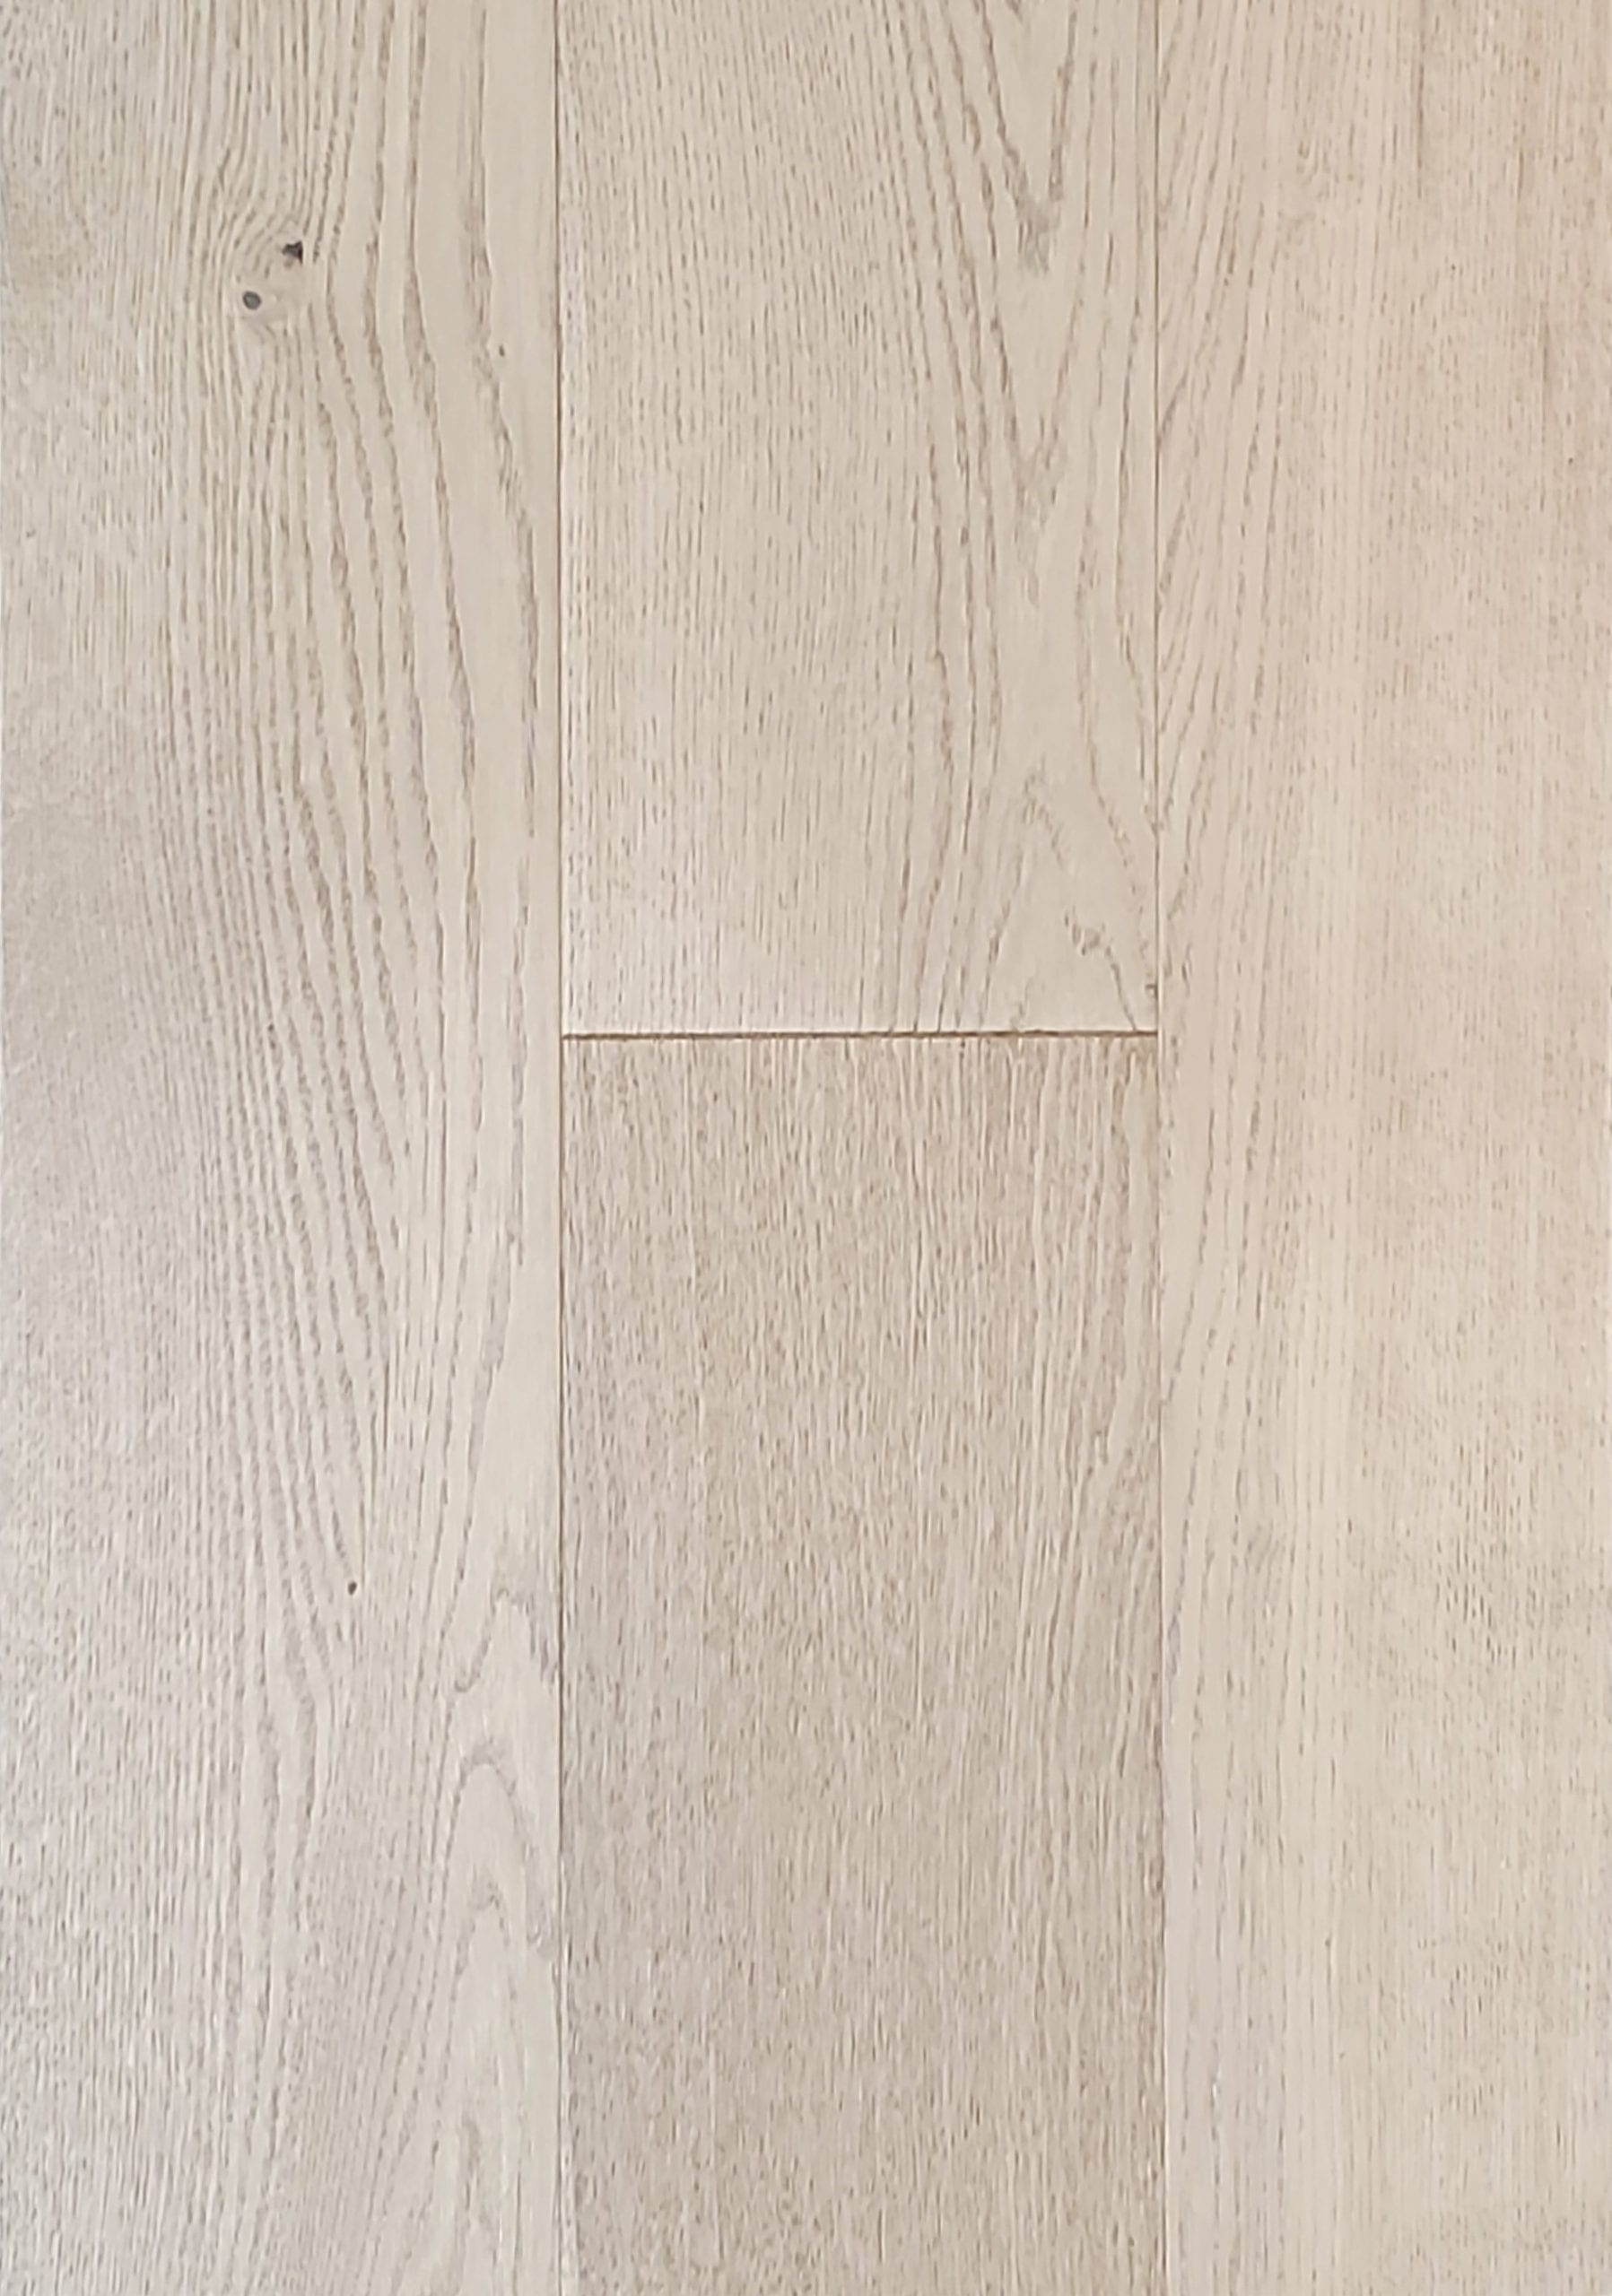 6.5inx.75inxRL European Oak Hardwood_Wirebrushed_Solitude_23.11sfct_4.99